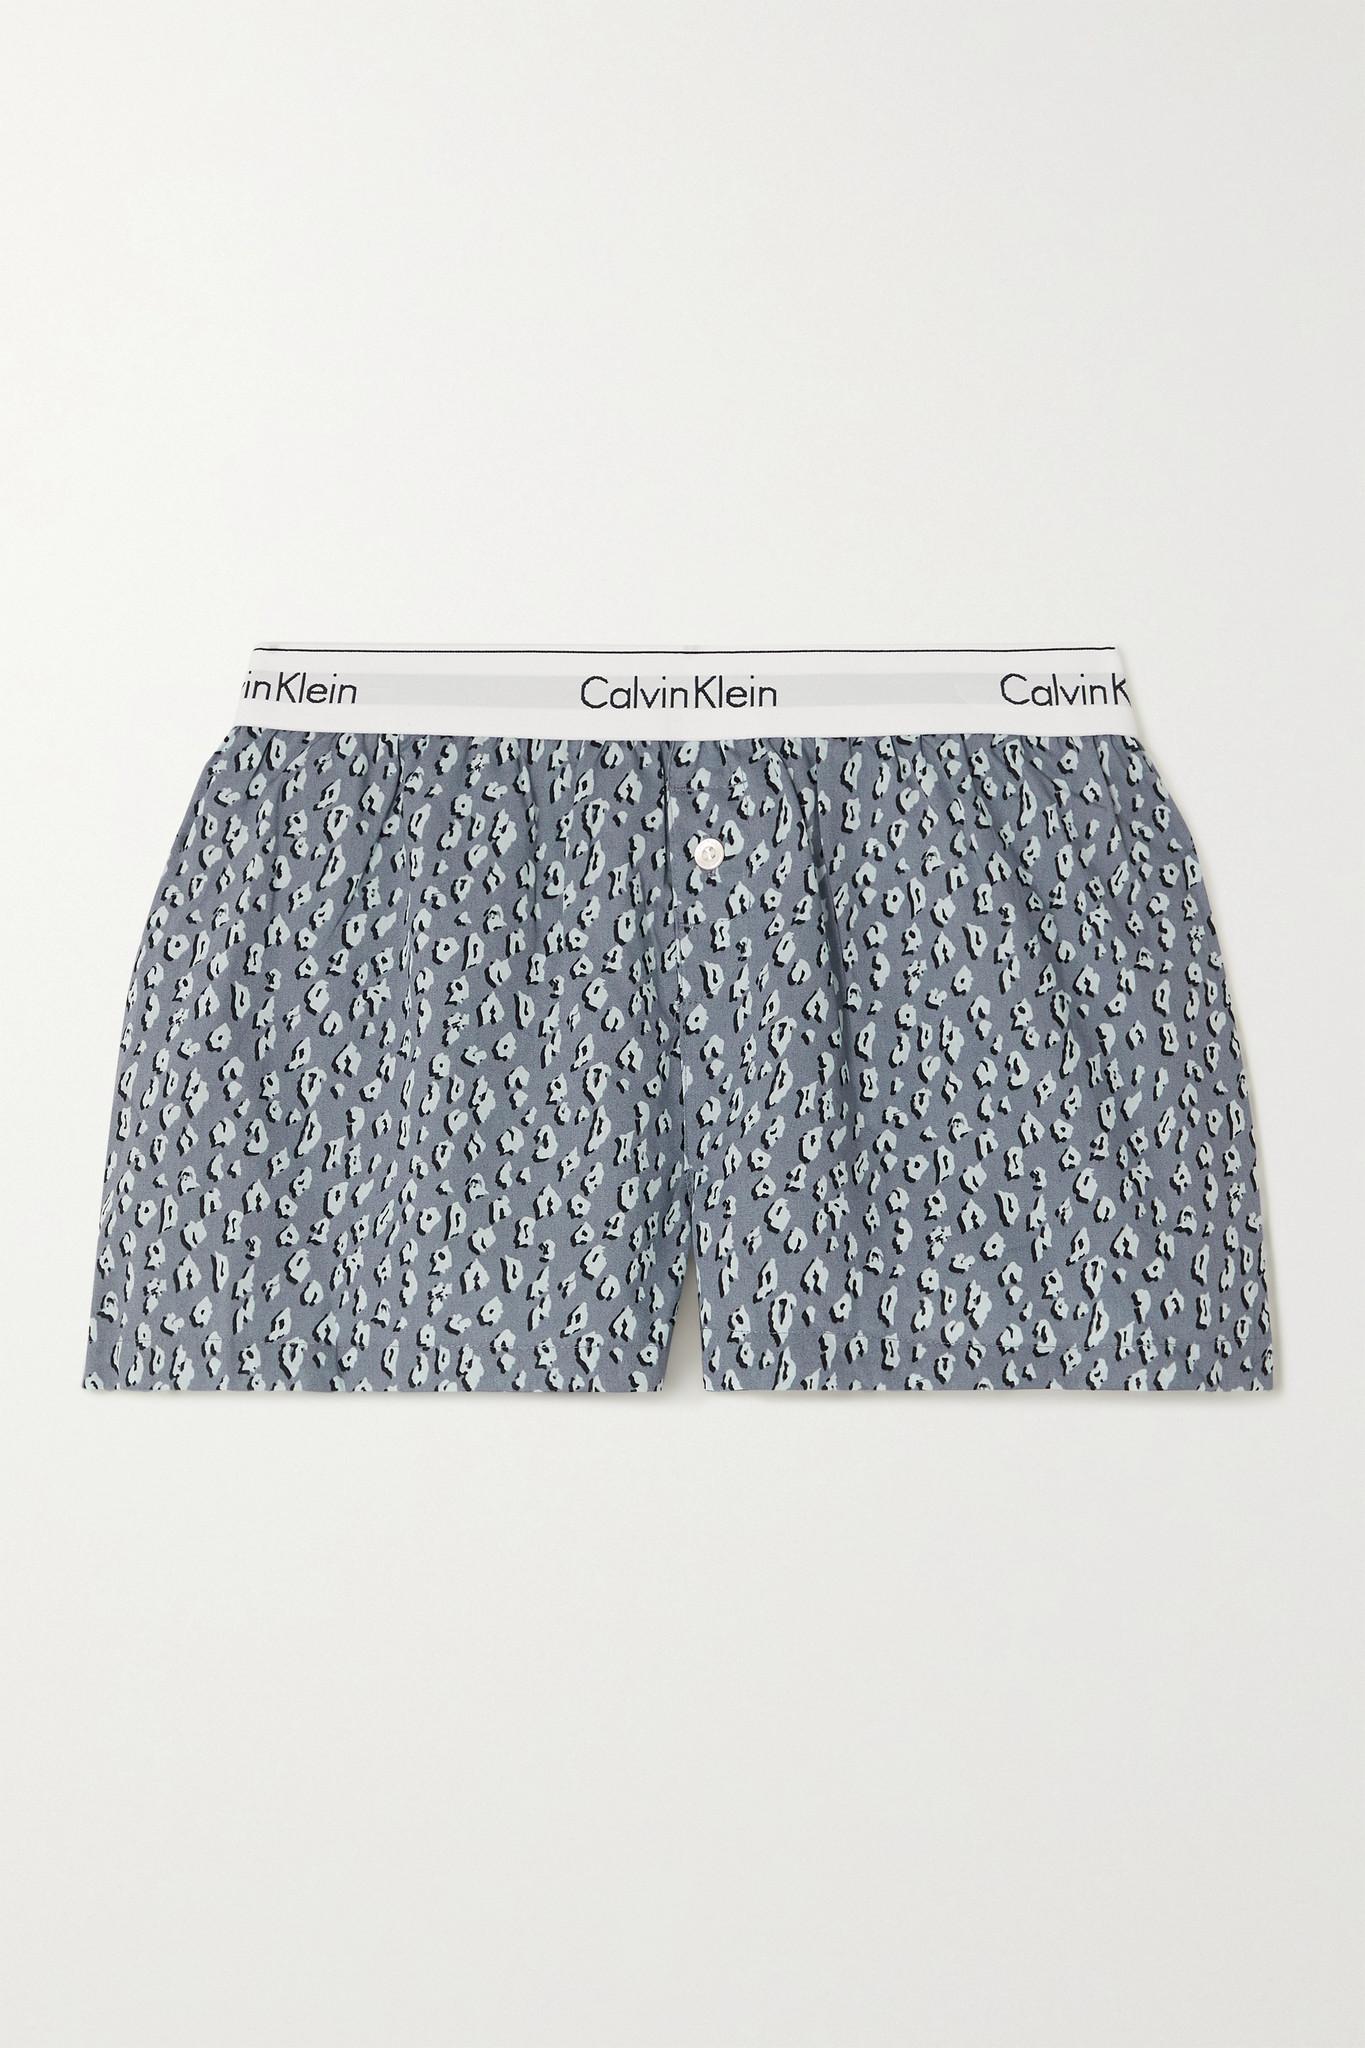 CALVIN KLEIN UNDERWEAR - 豹纹纯棉短睡裤 - 灰色 - x large